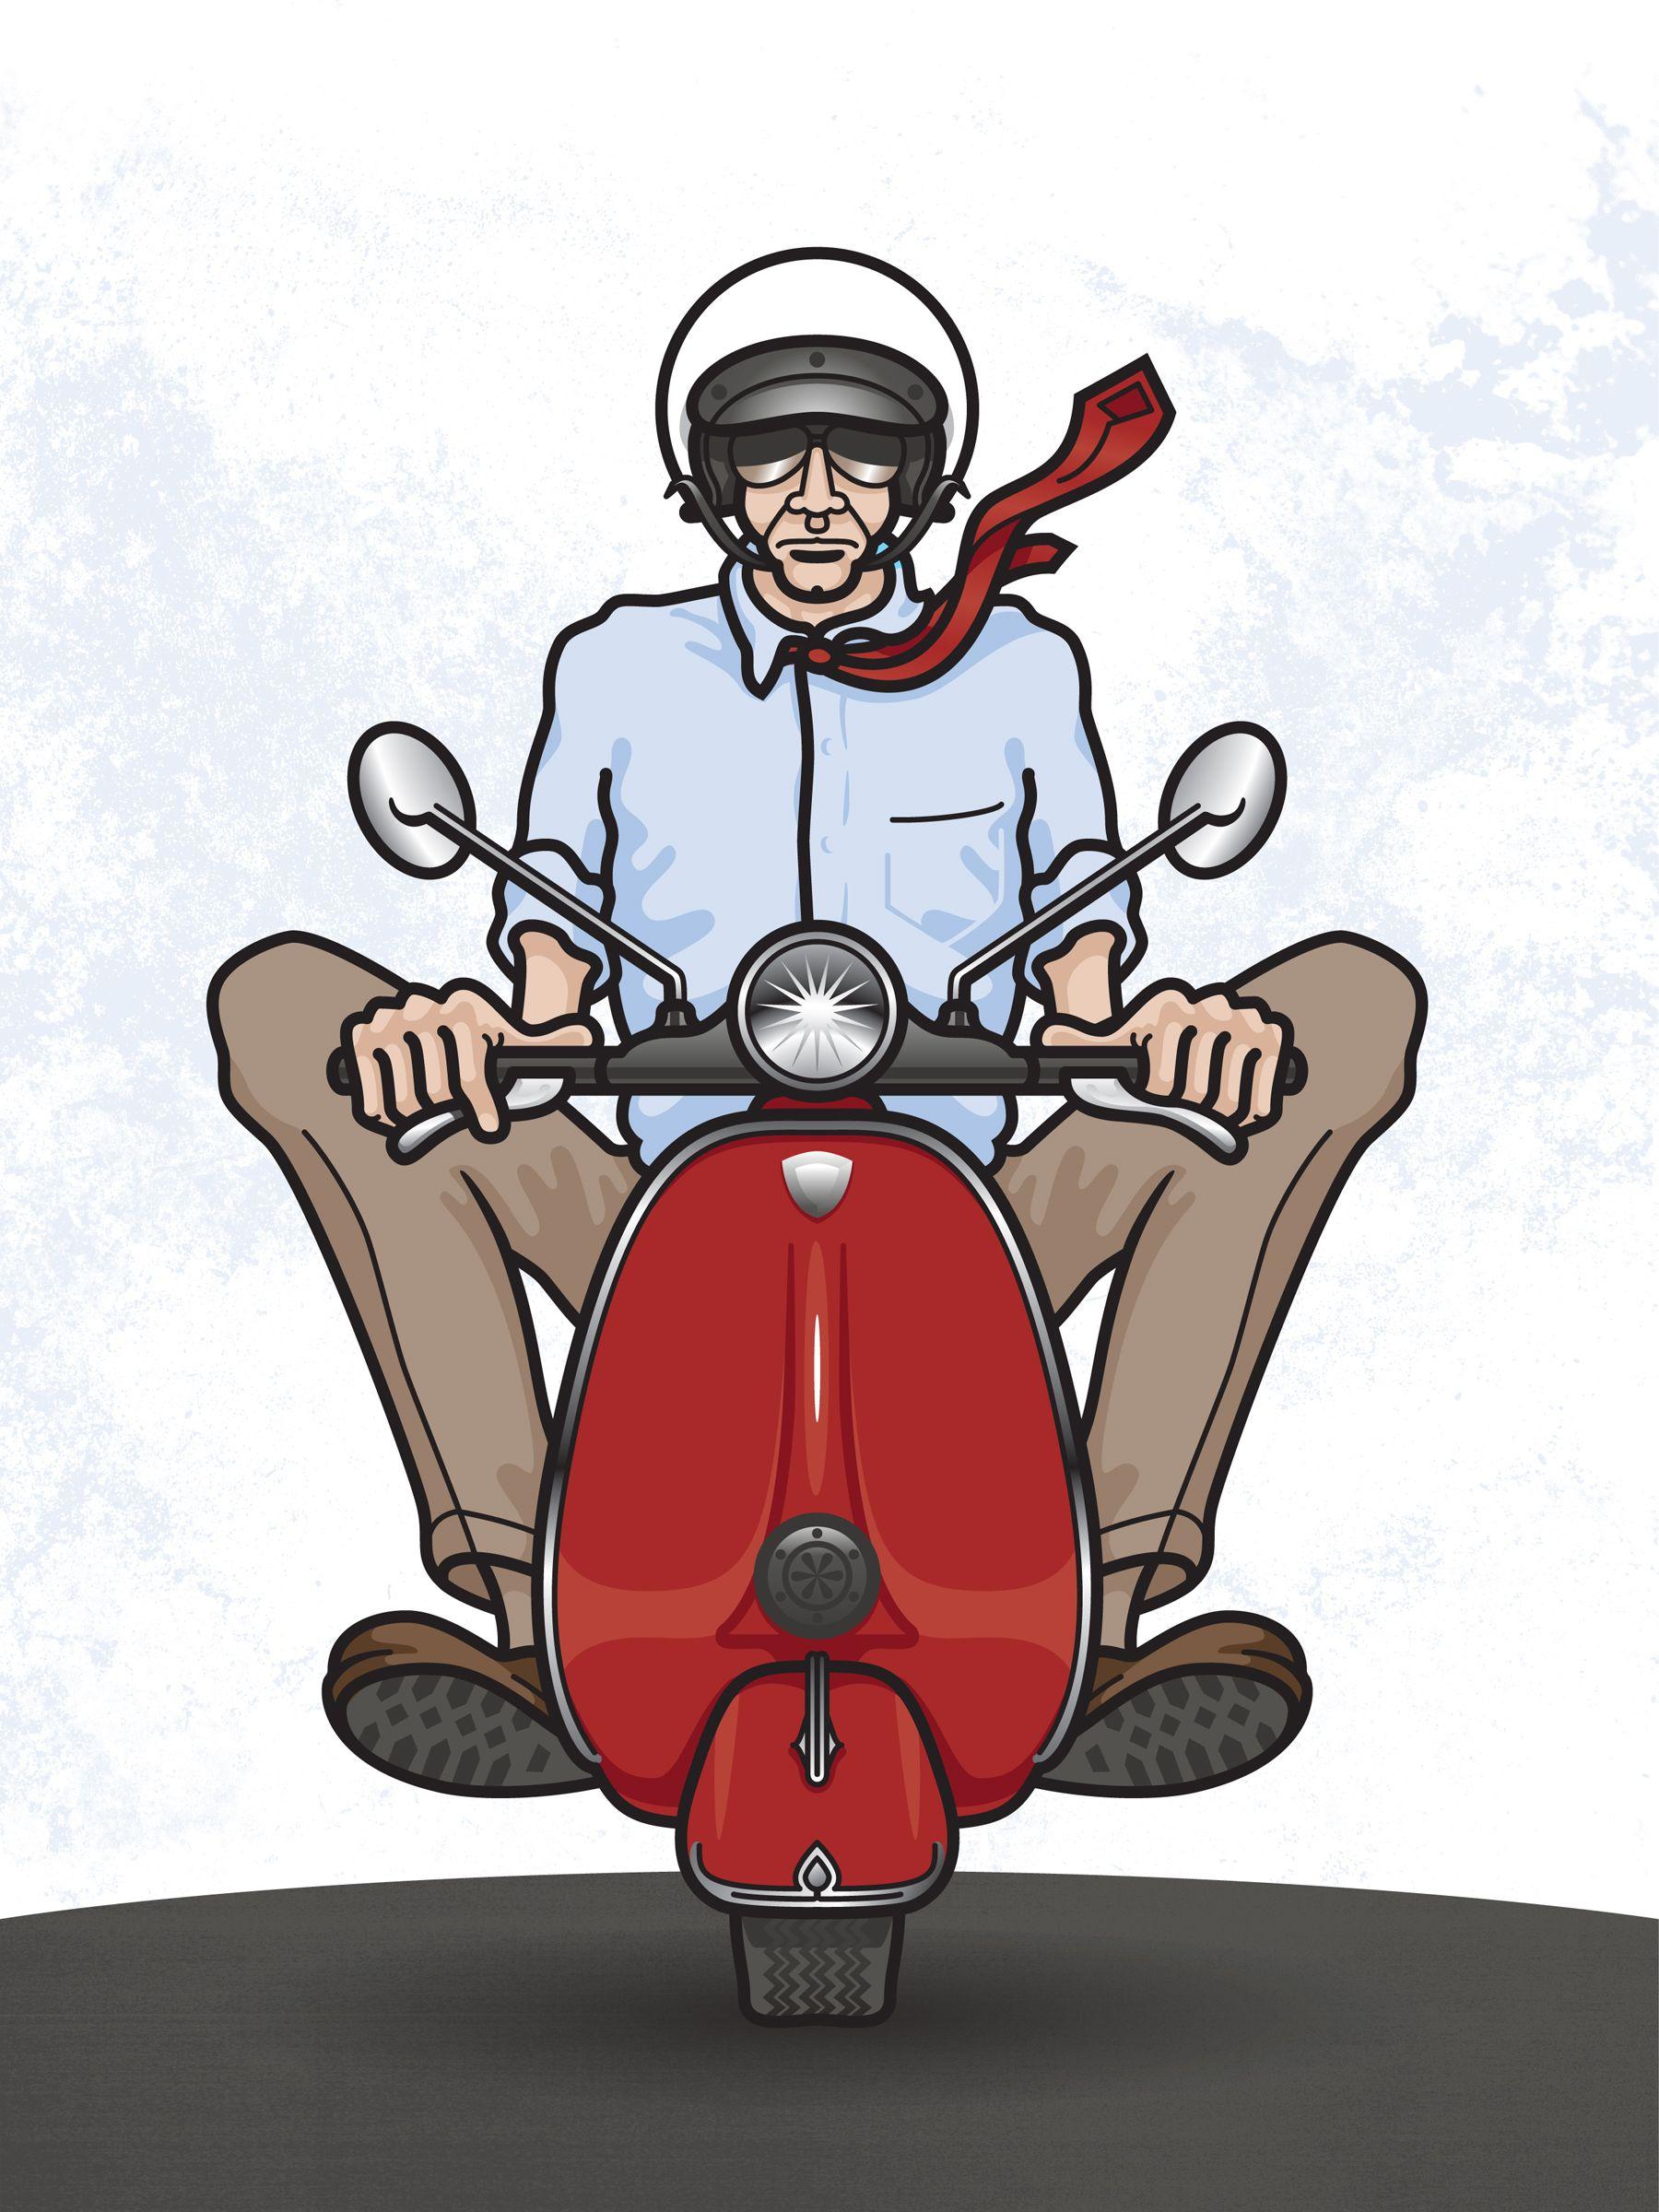 Kumpulan Gambar Sepeda Motor Retro Terlengkap Dinding Motor